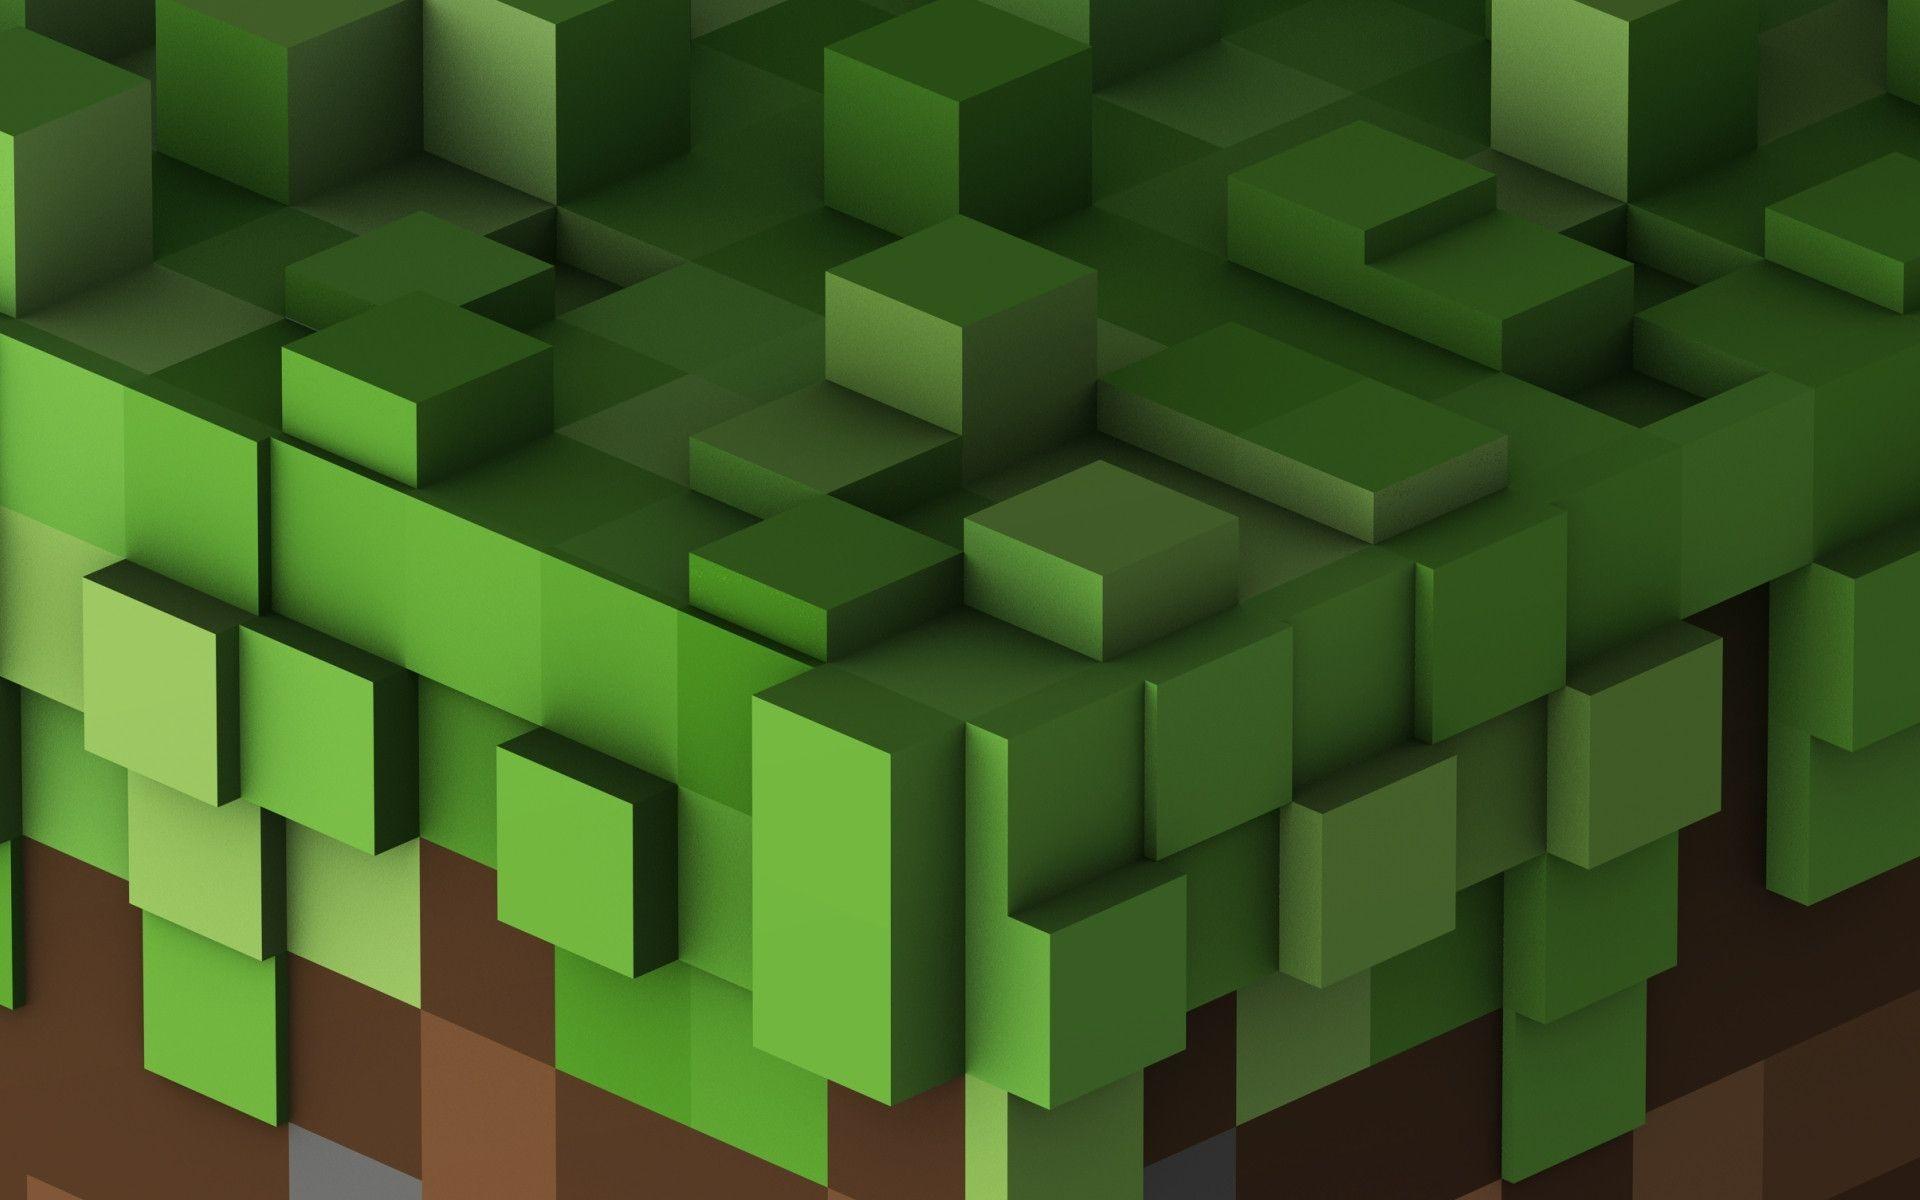 Good Wallpaper Minecraft Cellphone - 311778-minecraft-wallpapers-1920x1200-for-windows  Image_90579.jpg